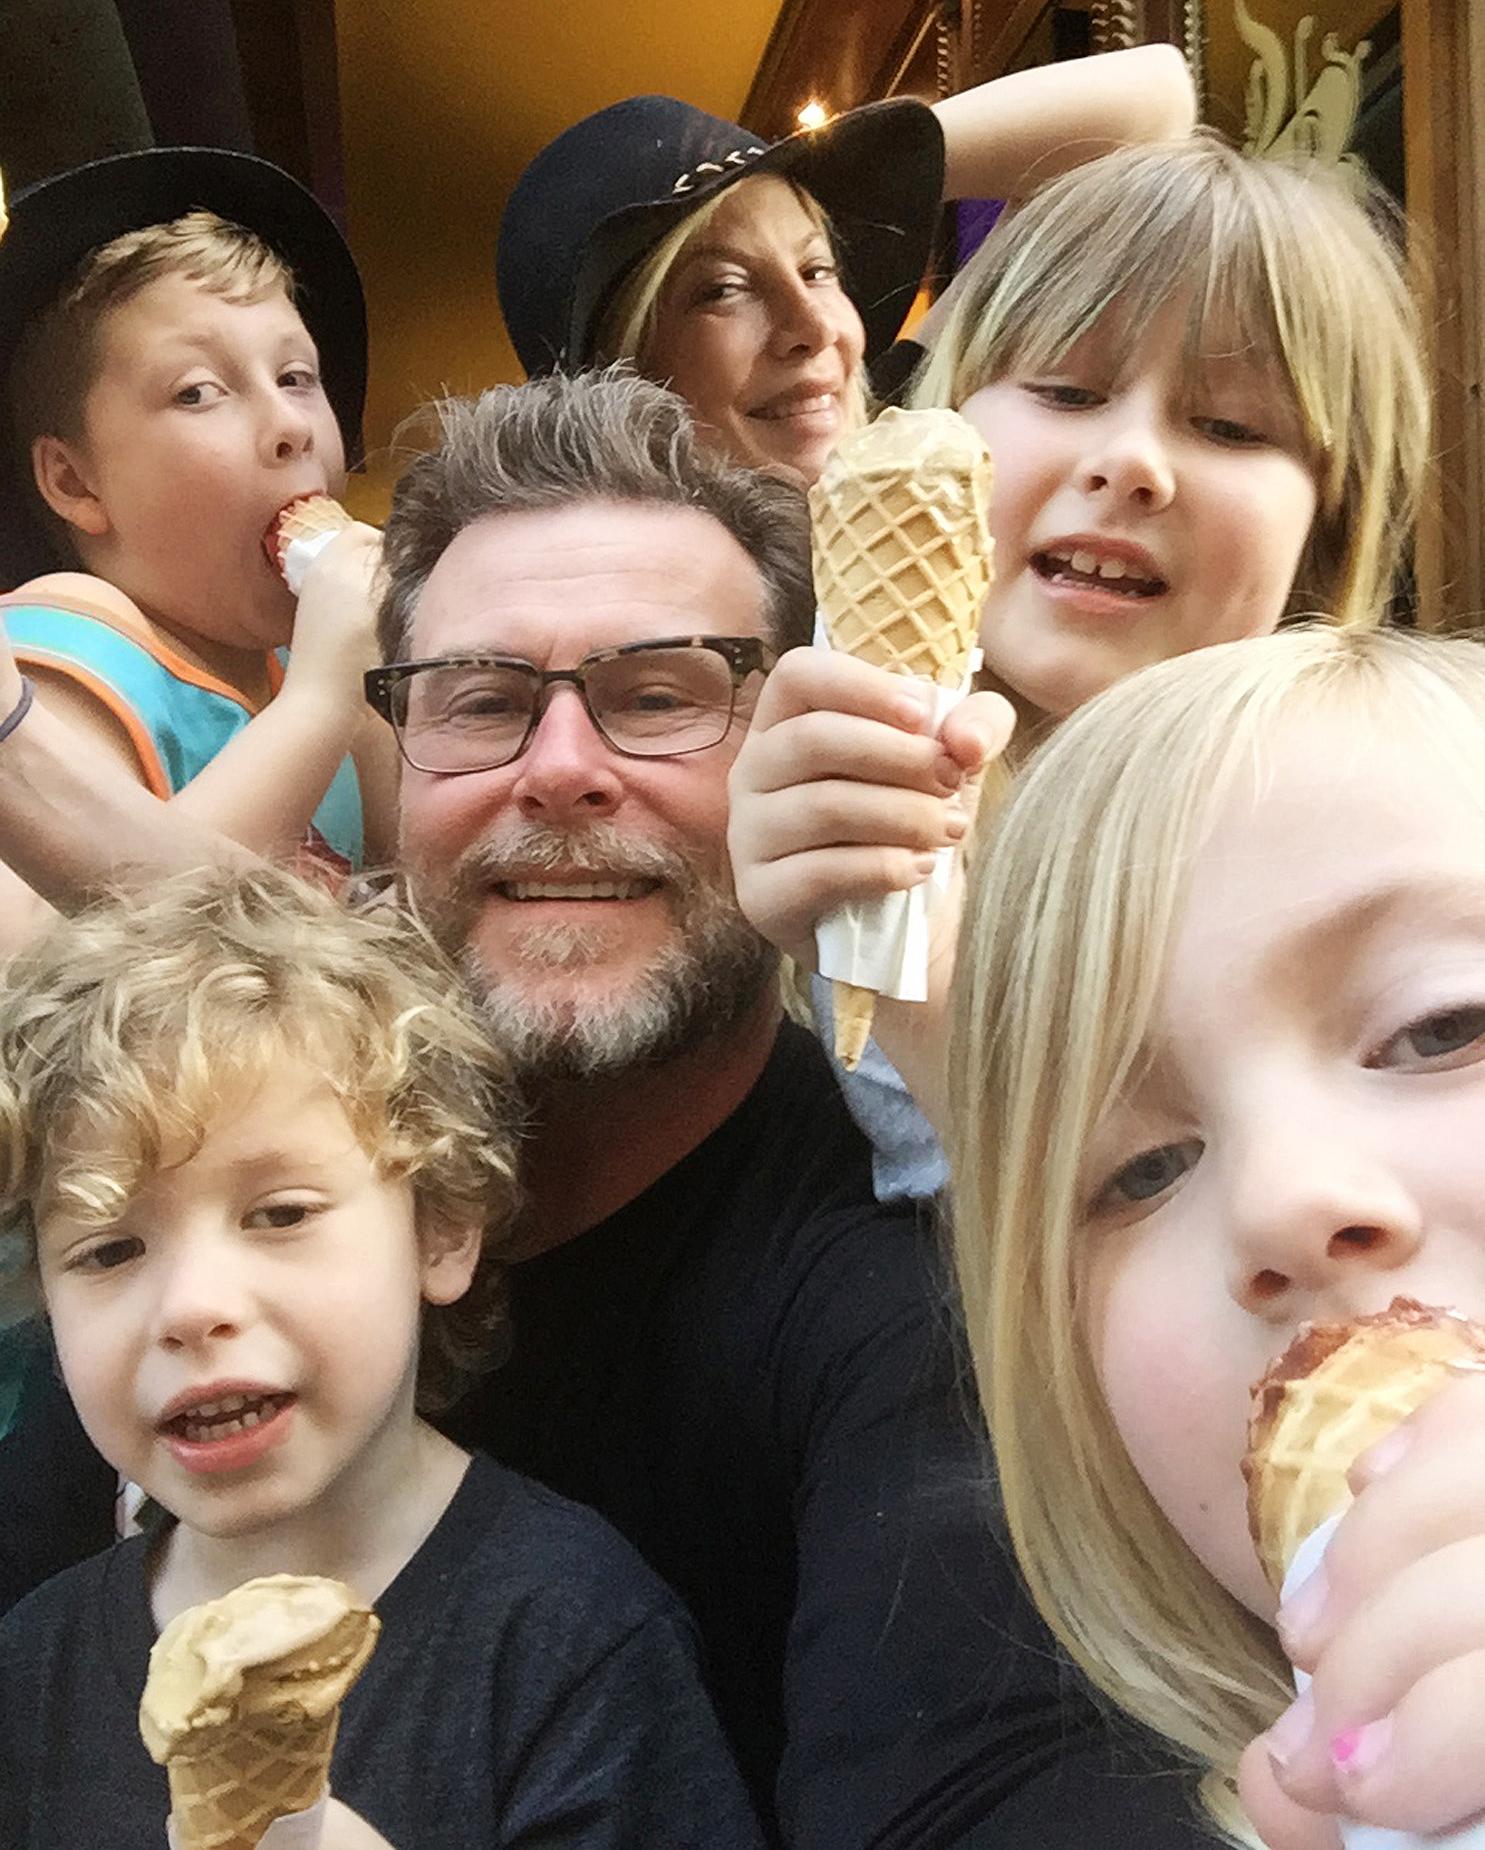 Tori Spelling Dean McDermott family Paris ice cream vacation - Tori Spelling and family getting ice cream at the famous Berthillon ice cream shop in Paris, France on May 16, 2016.